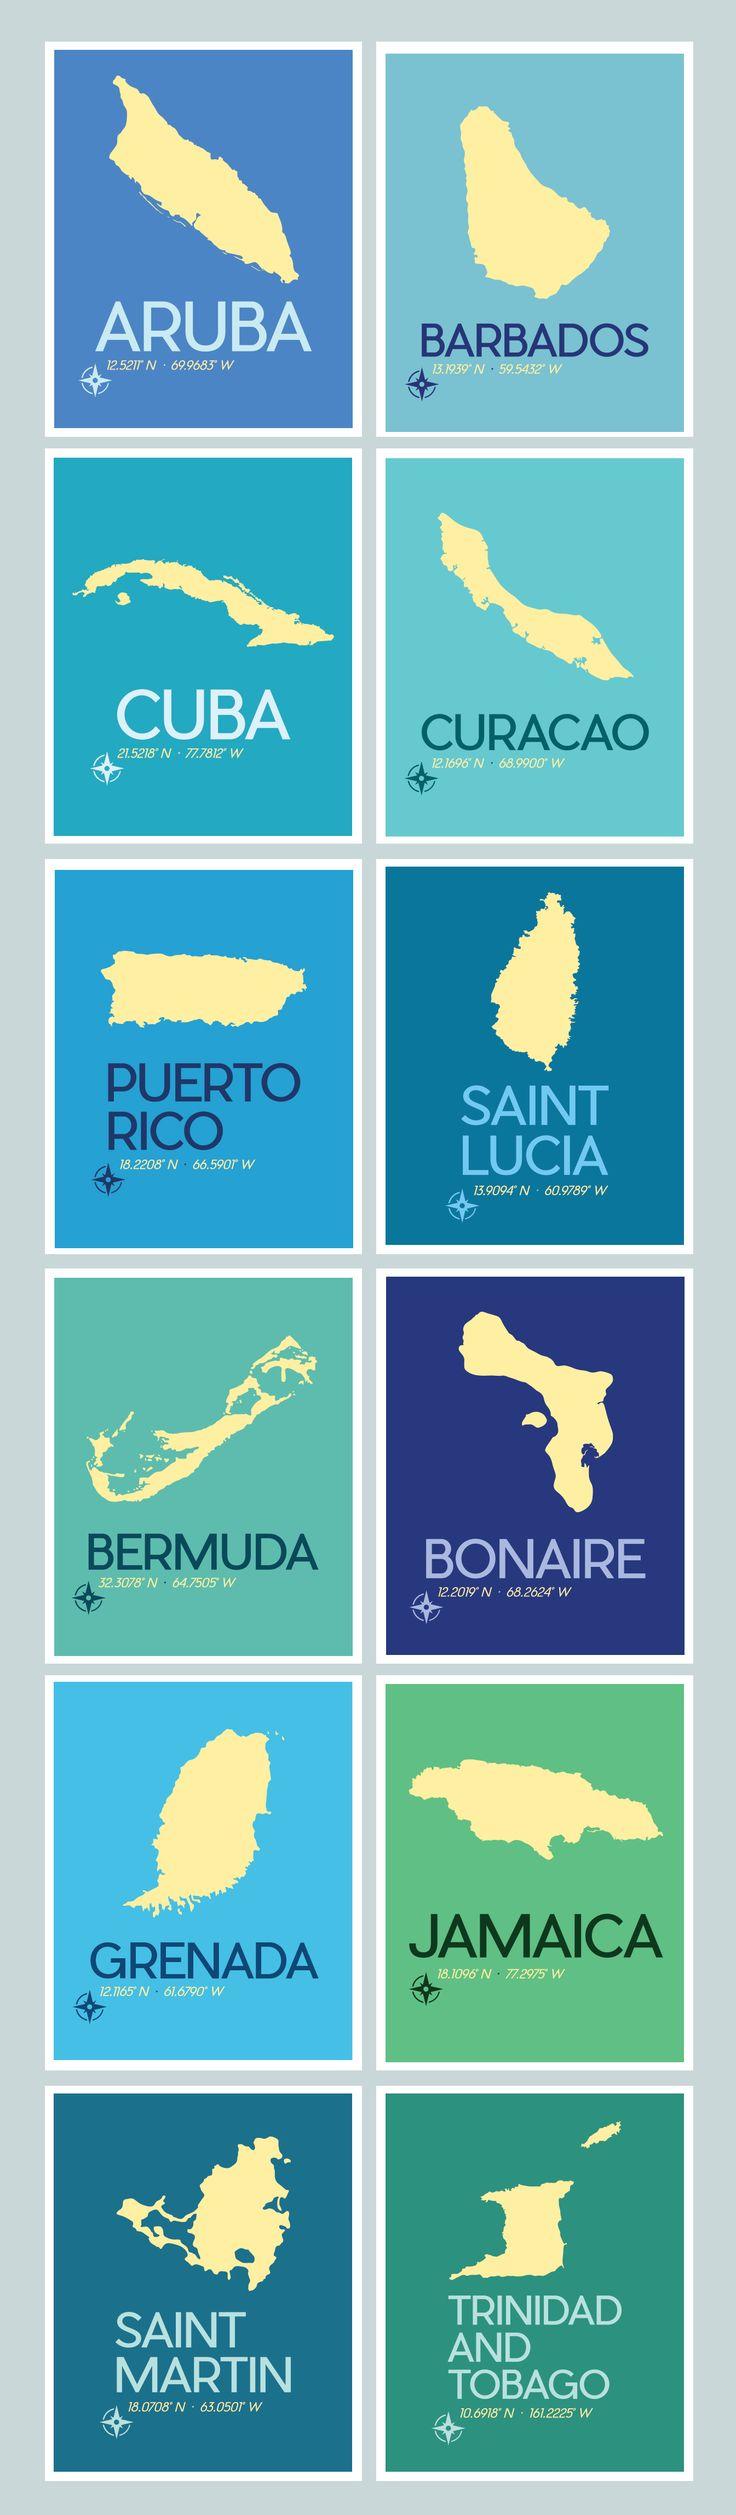 Caribbean Map Prints. Poster for travellers and vacationers. Aruba, Barbados, Cuba, Curacao, Puerto Rico, St. Lucia, Grenada, Bermuda, Bonaire,St. Martin, Trinidad and Tobago. #travel #art